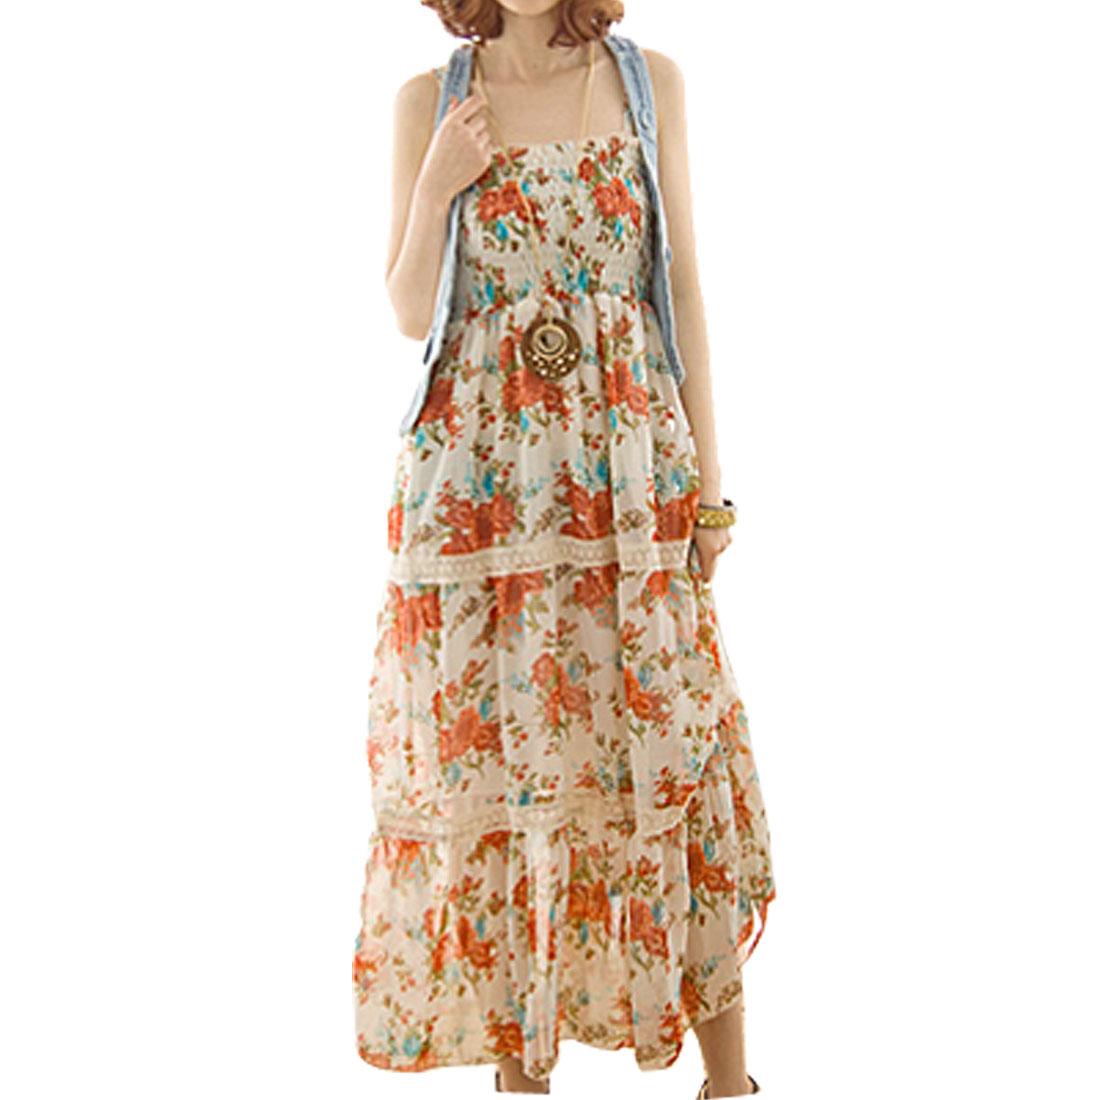 Ladies Spaghetti Straps Floral Prints Chiffon Maxi Dress Beige XS